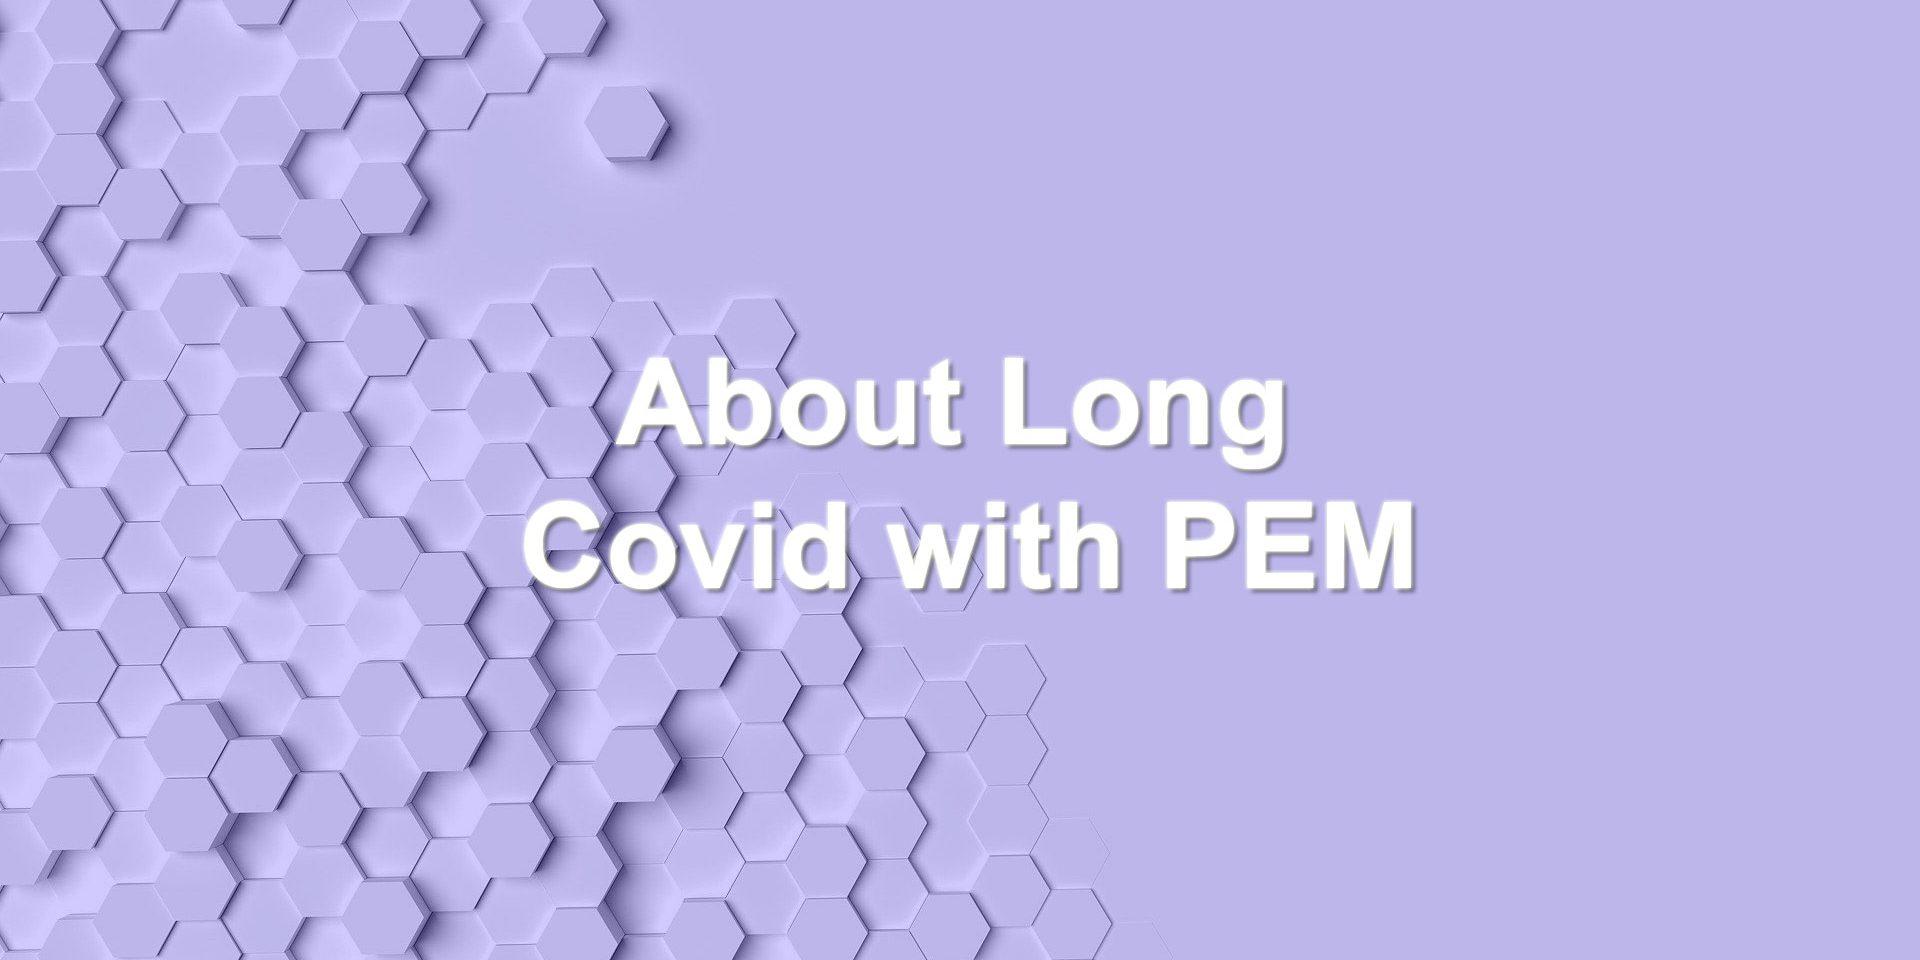 About Long Covid hexagonal blocks on purple background